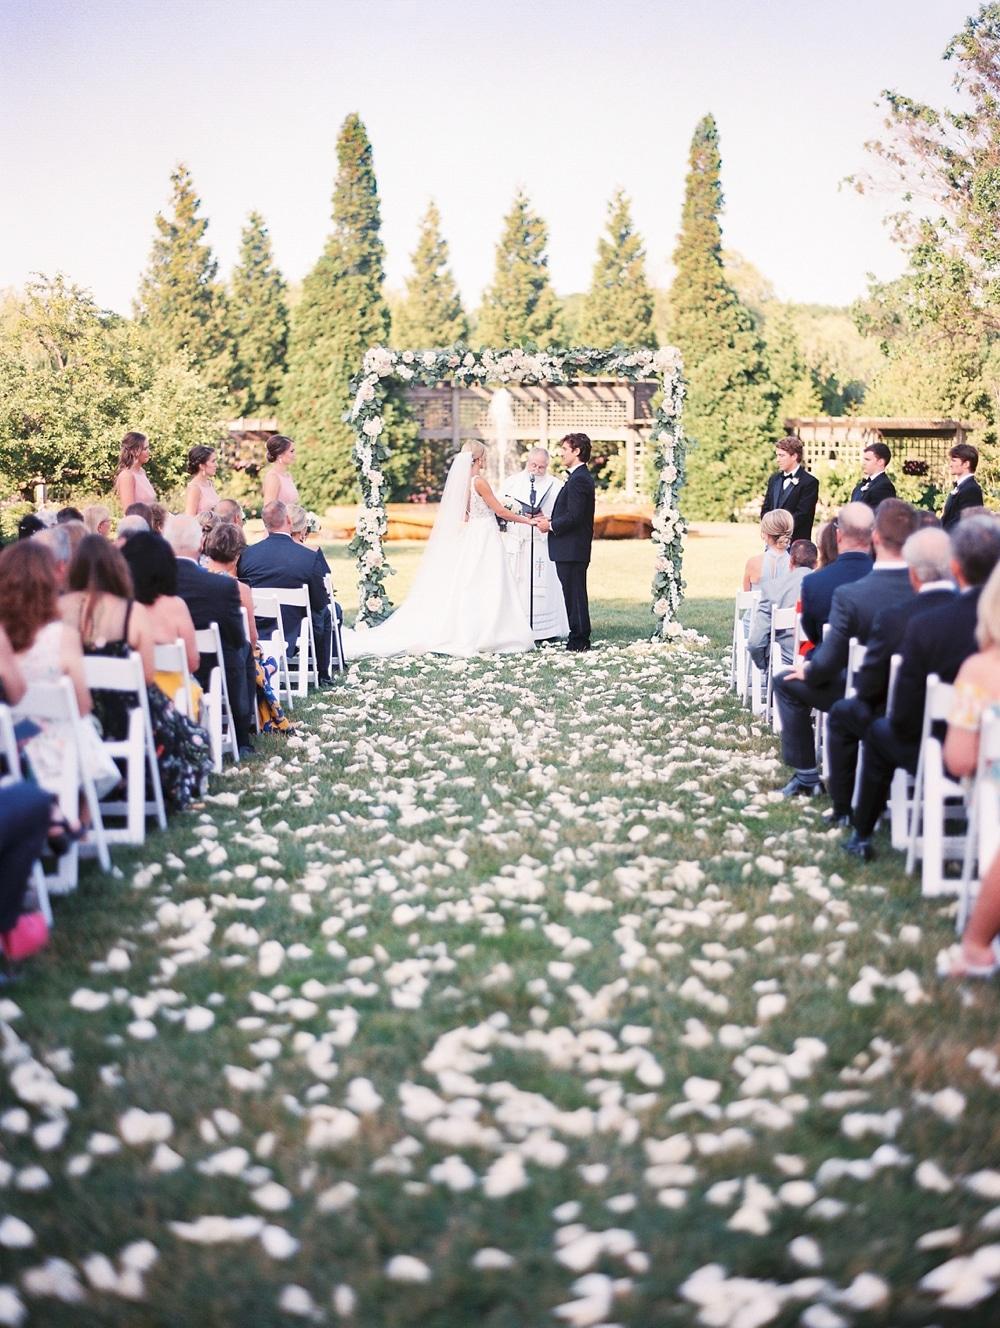 Kristin-La-Voie-Photography-chicago-botanic-garden-wedding-photos-35